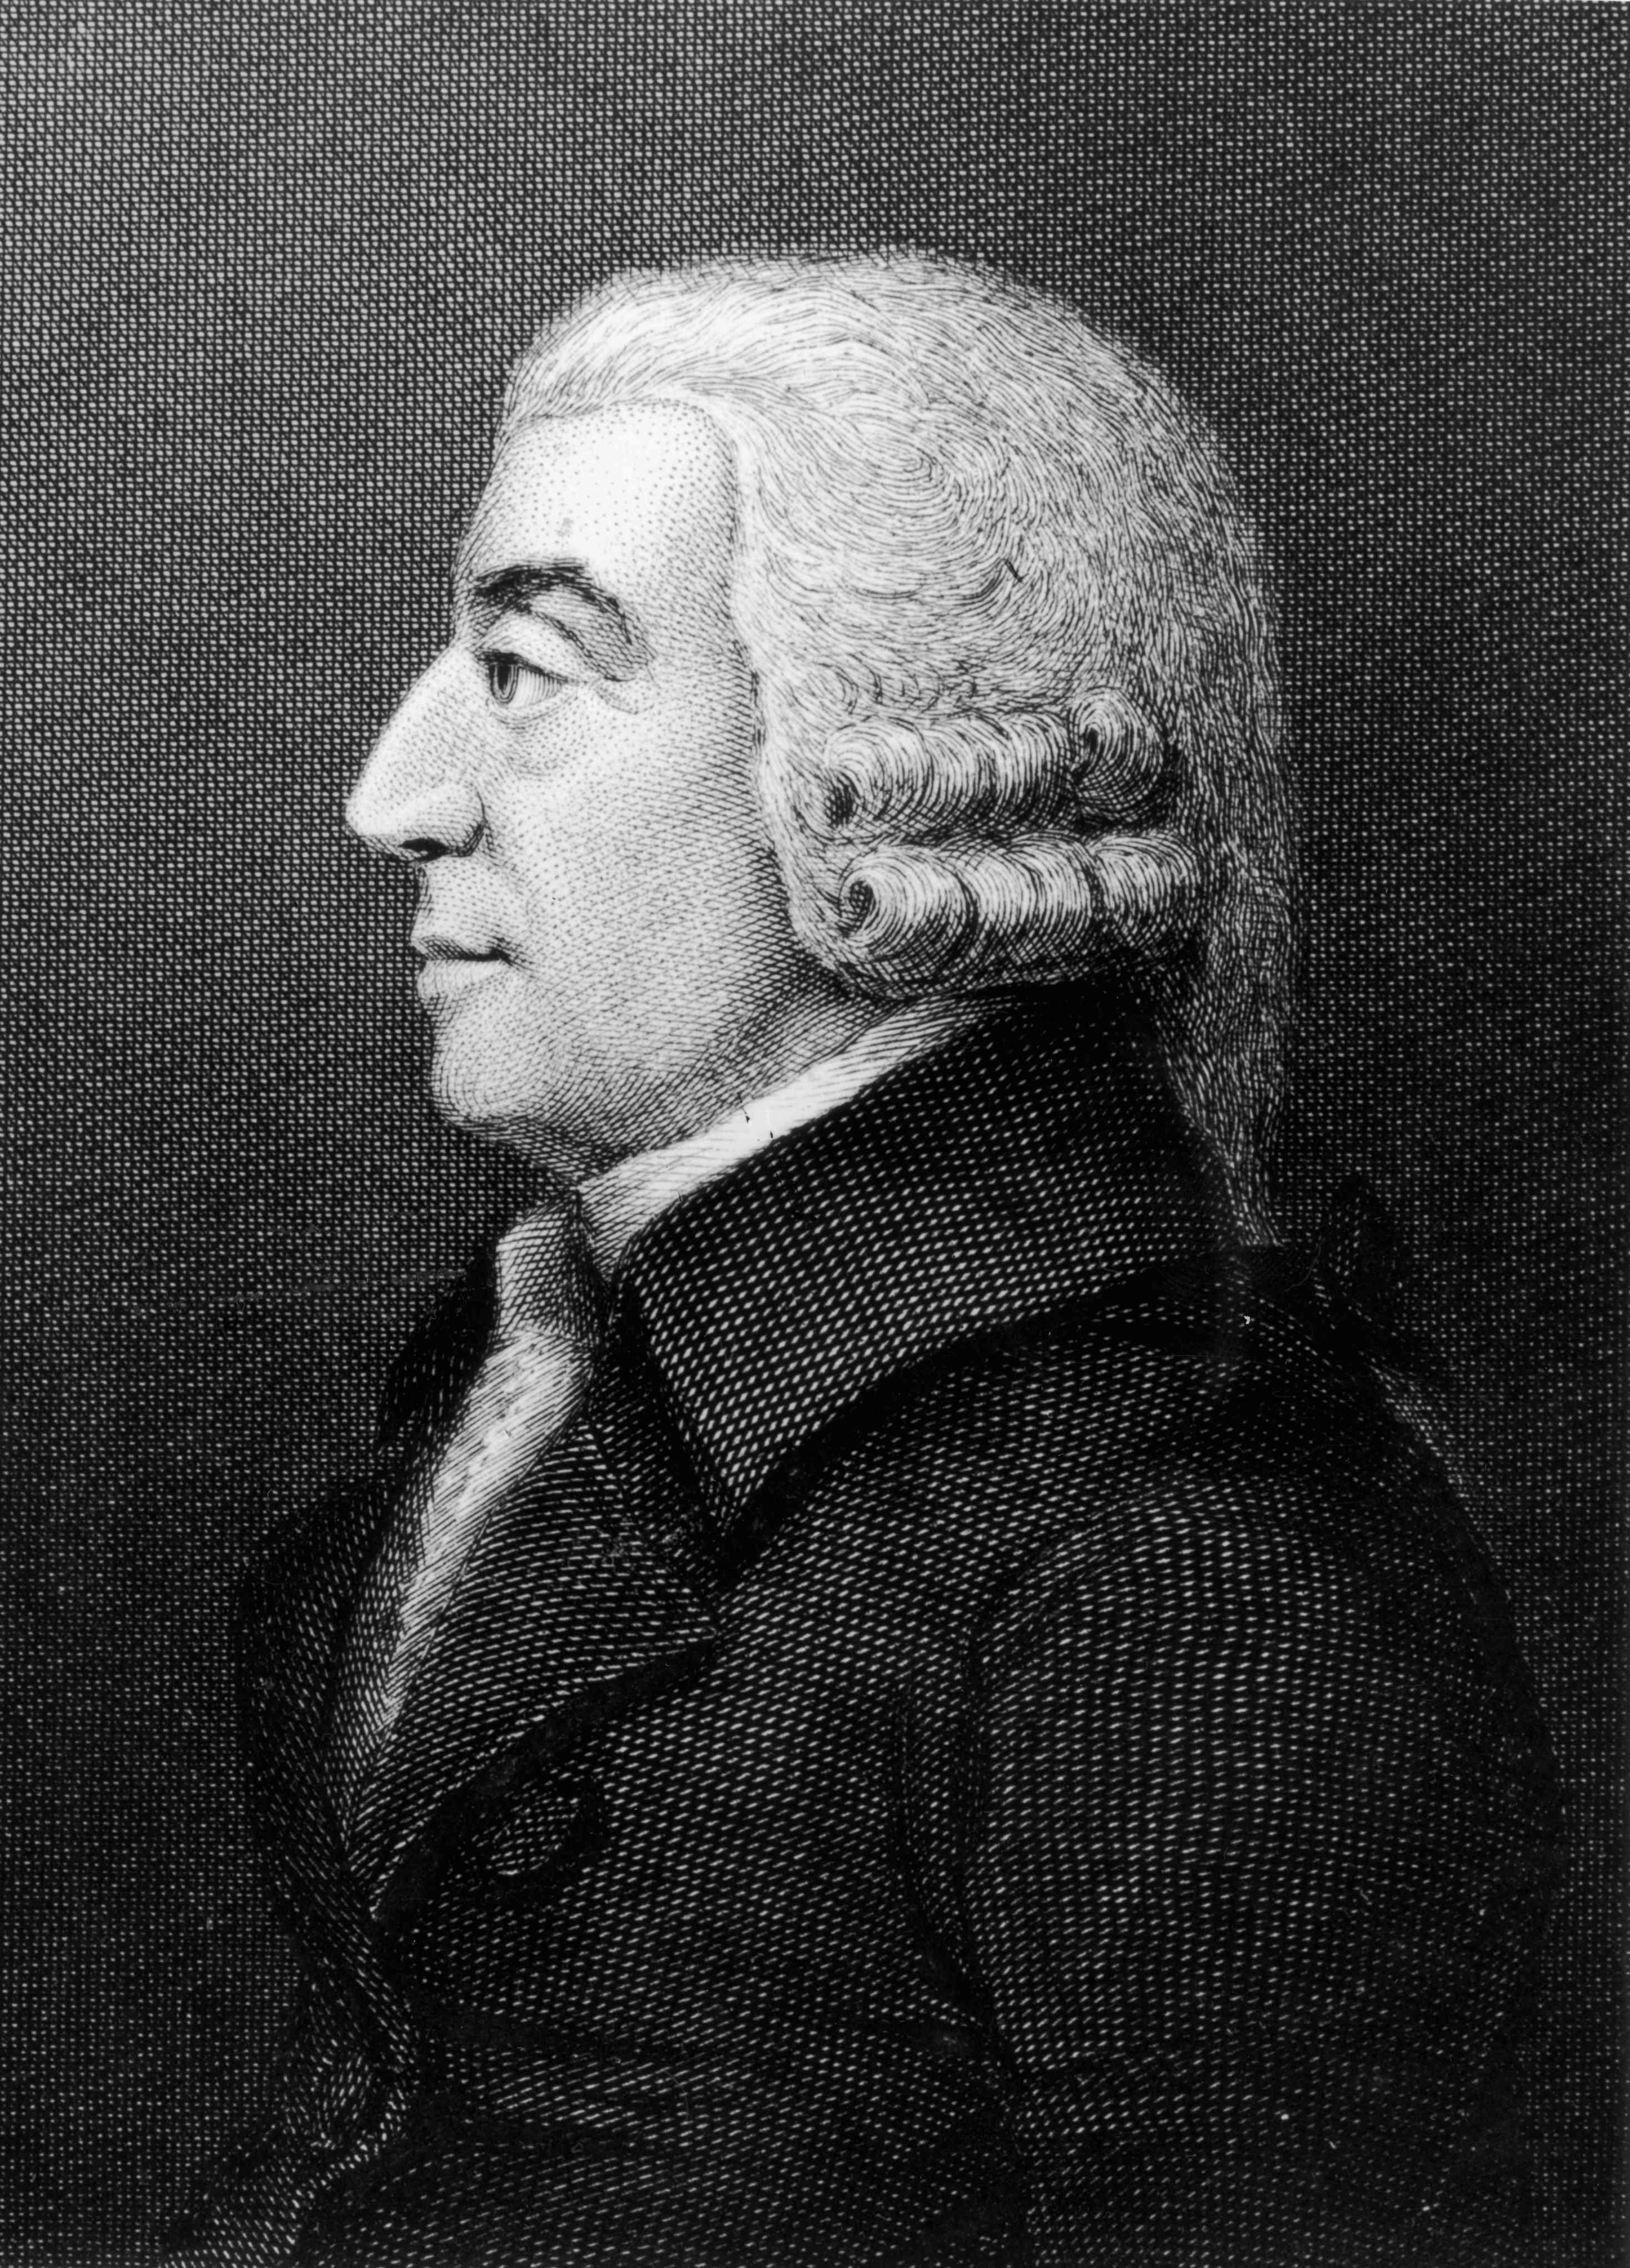 Scottish political economist and philosopher Adam Smith (1723 - 1790).